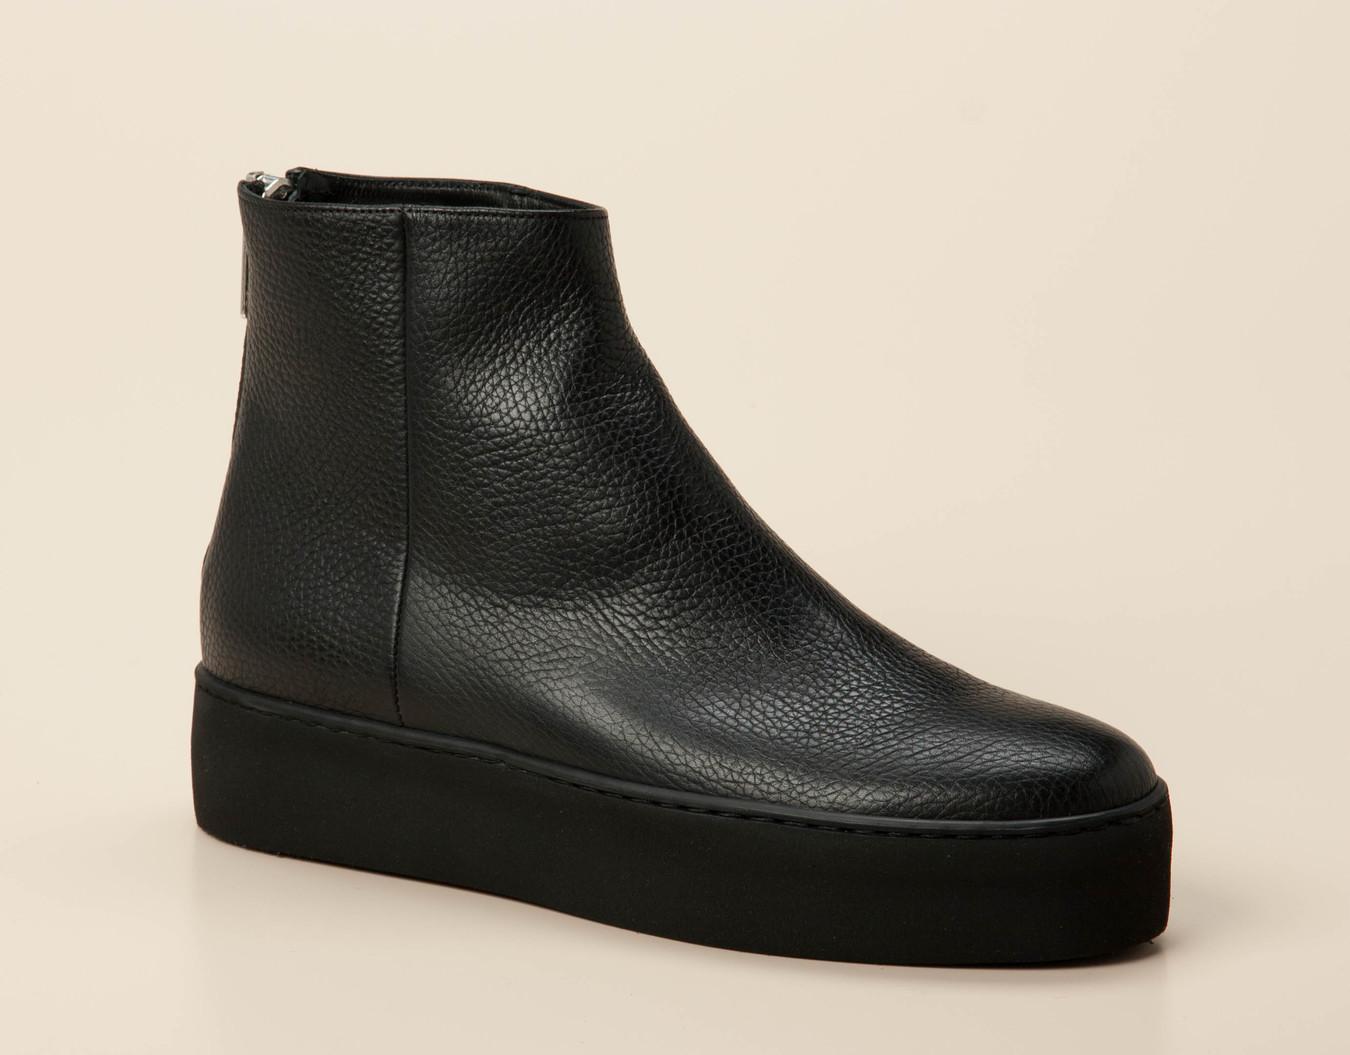 beb568c0f3e639 Konstantin Starke Damen Stiefelette in schwarz kaufen